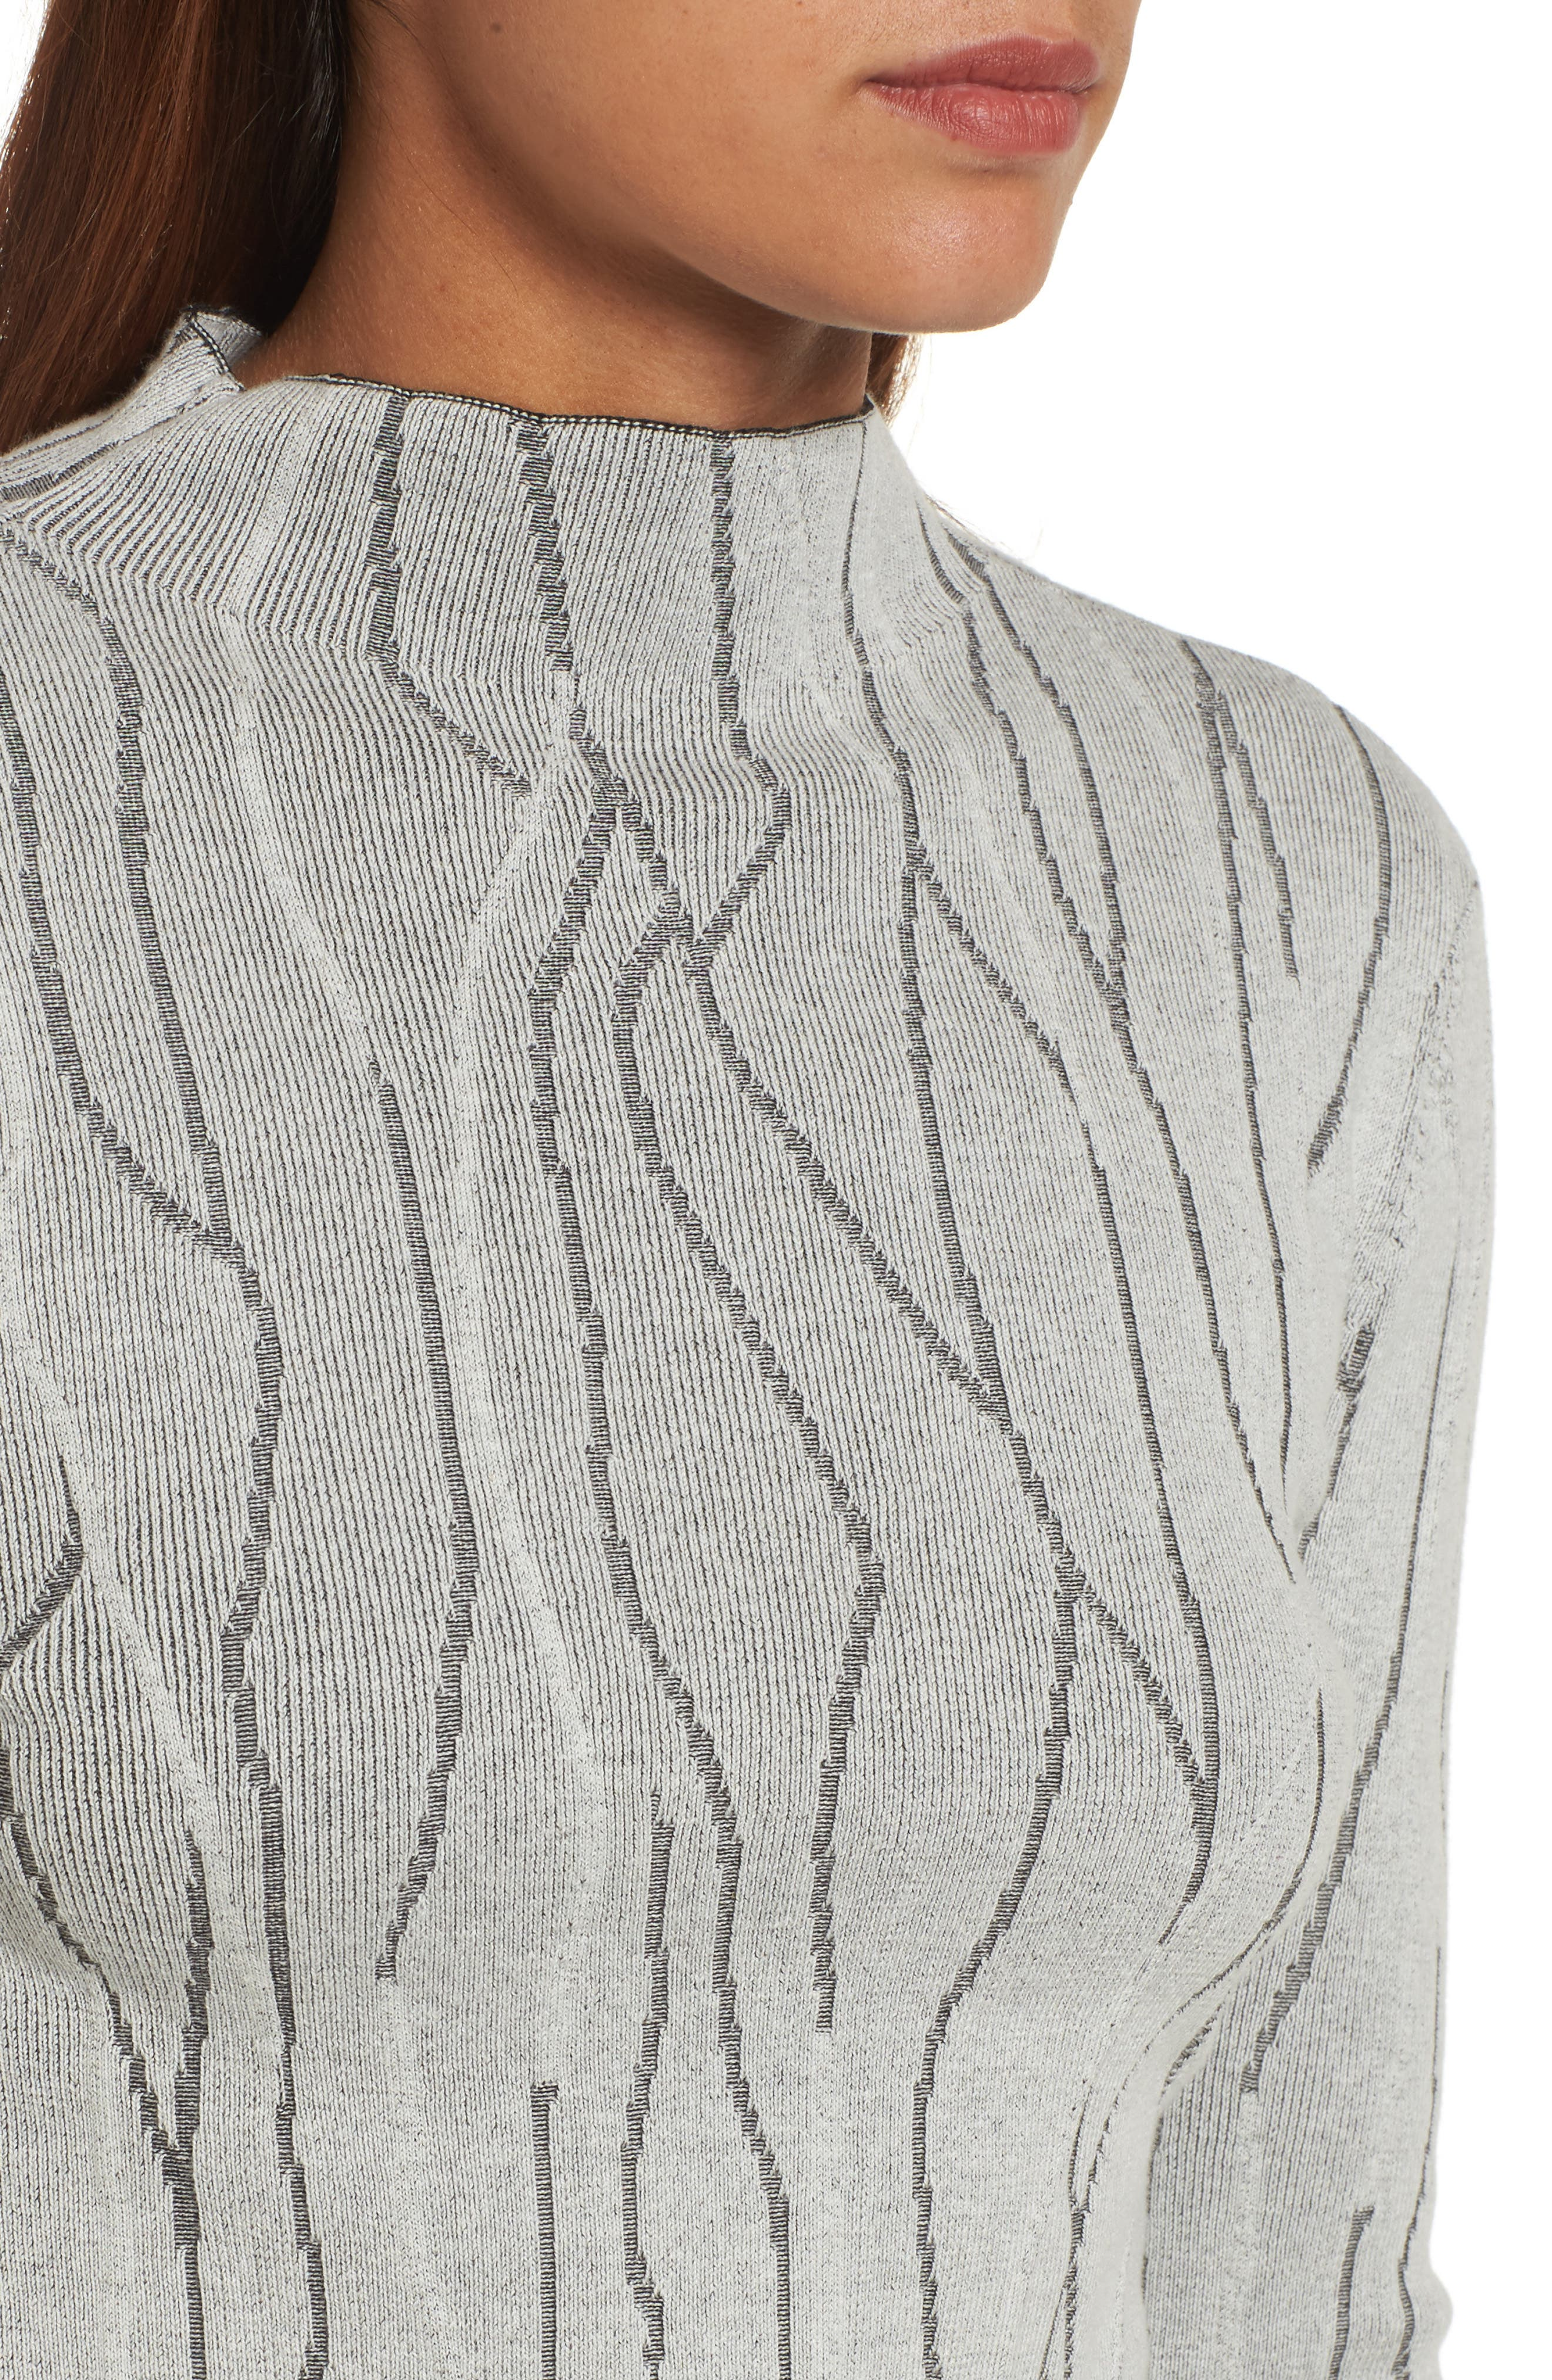 Alternate Image 4  - NIC+ZOE Artisanal Crackle Jacquard Sweater (Regular & Petite)